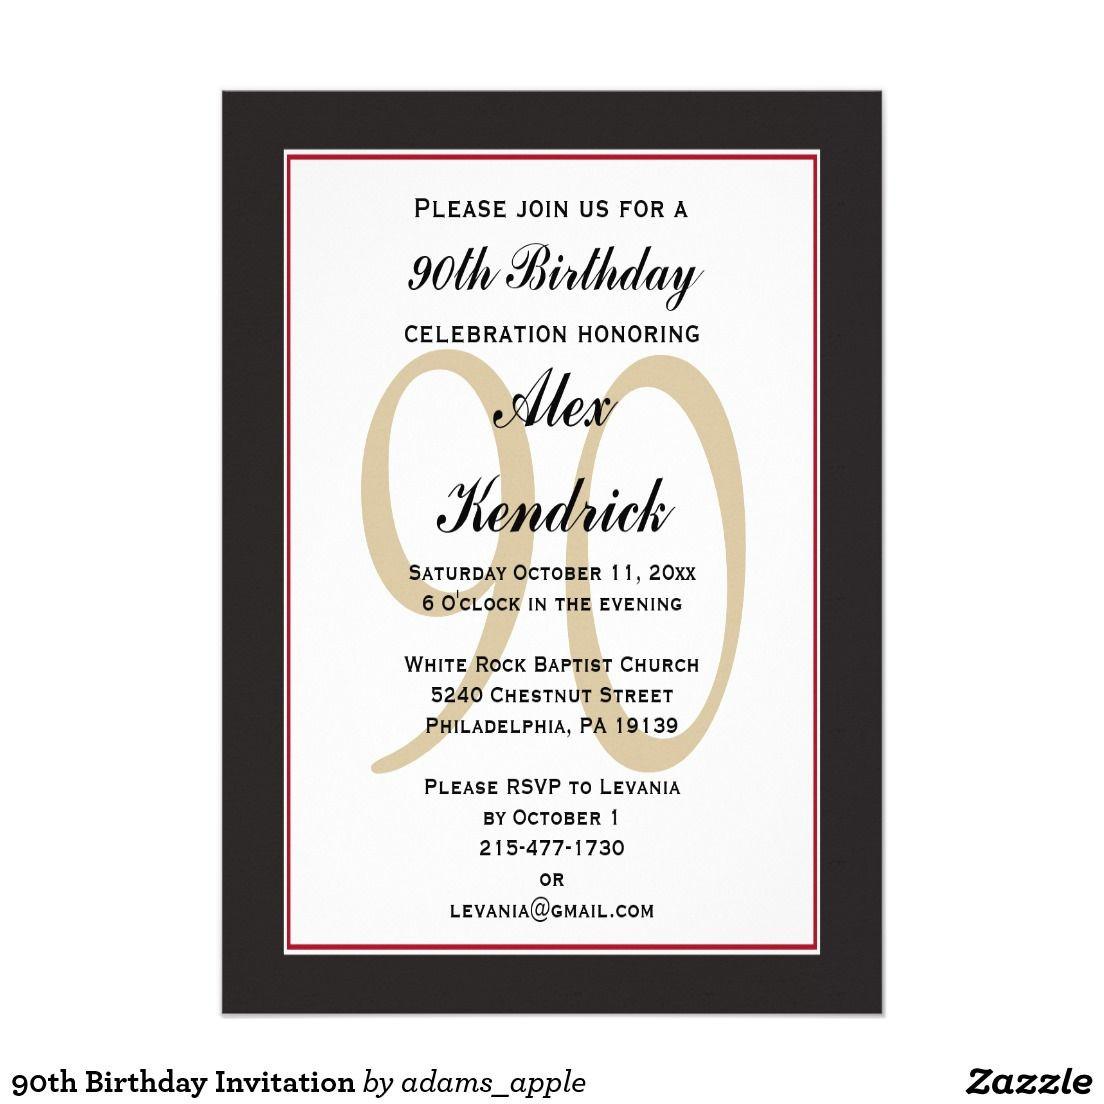 90th Birthday Invitation Wording  90th Birthday Invitation